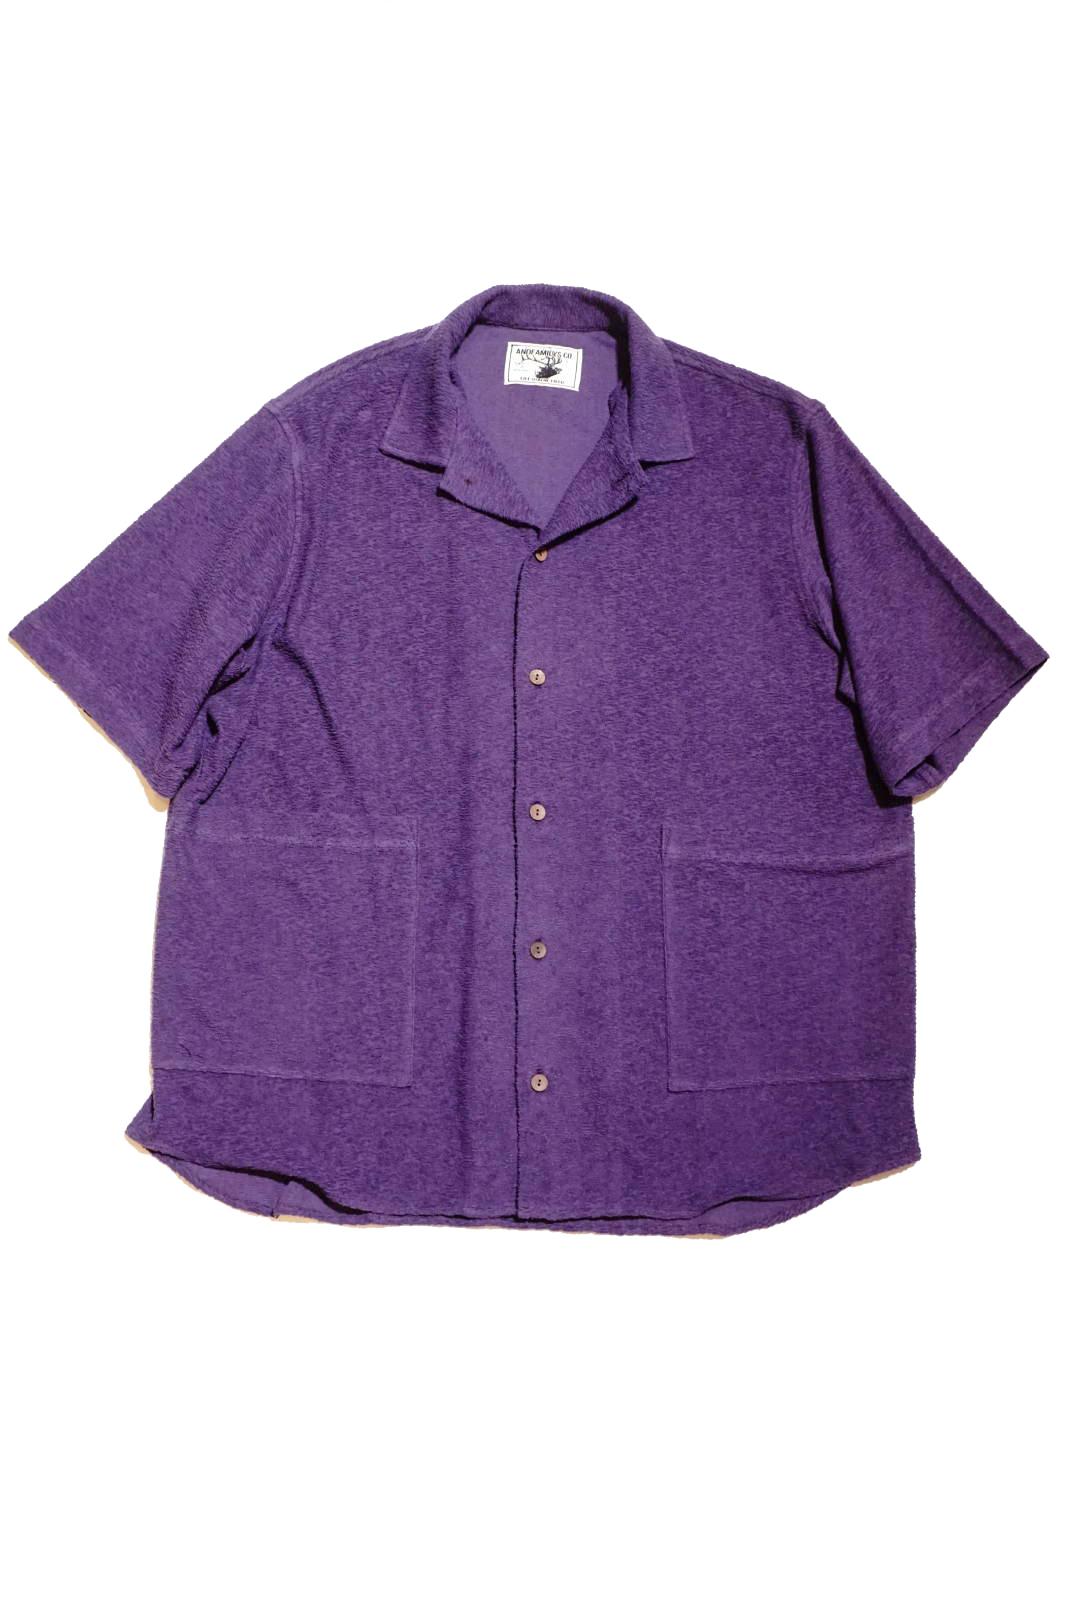 ANDFAMILYS CO. Pile Shirts GP